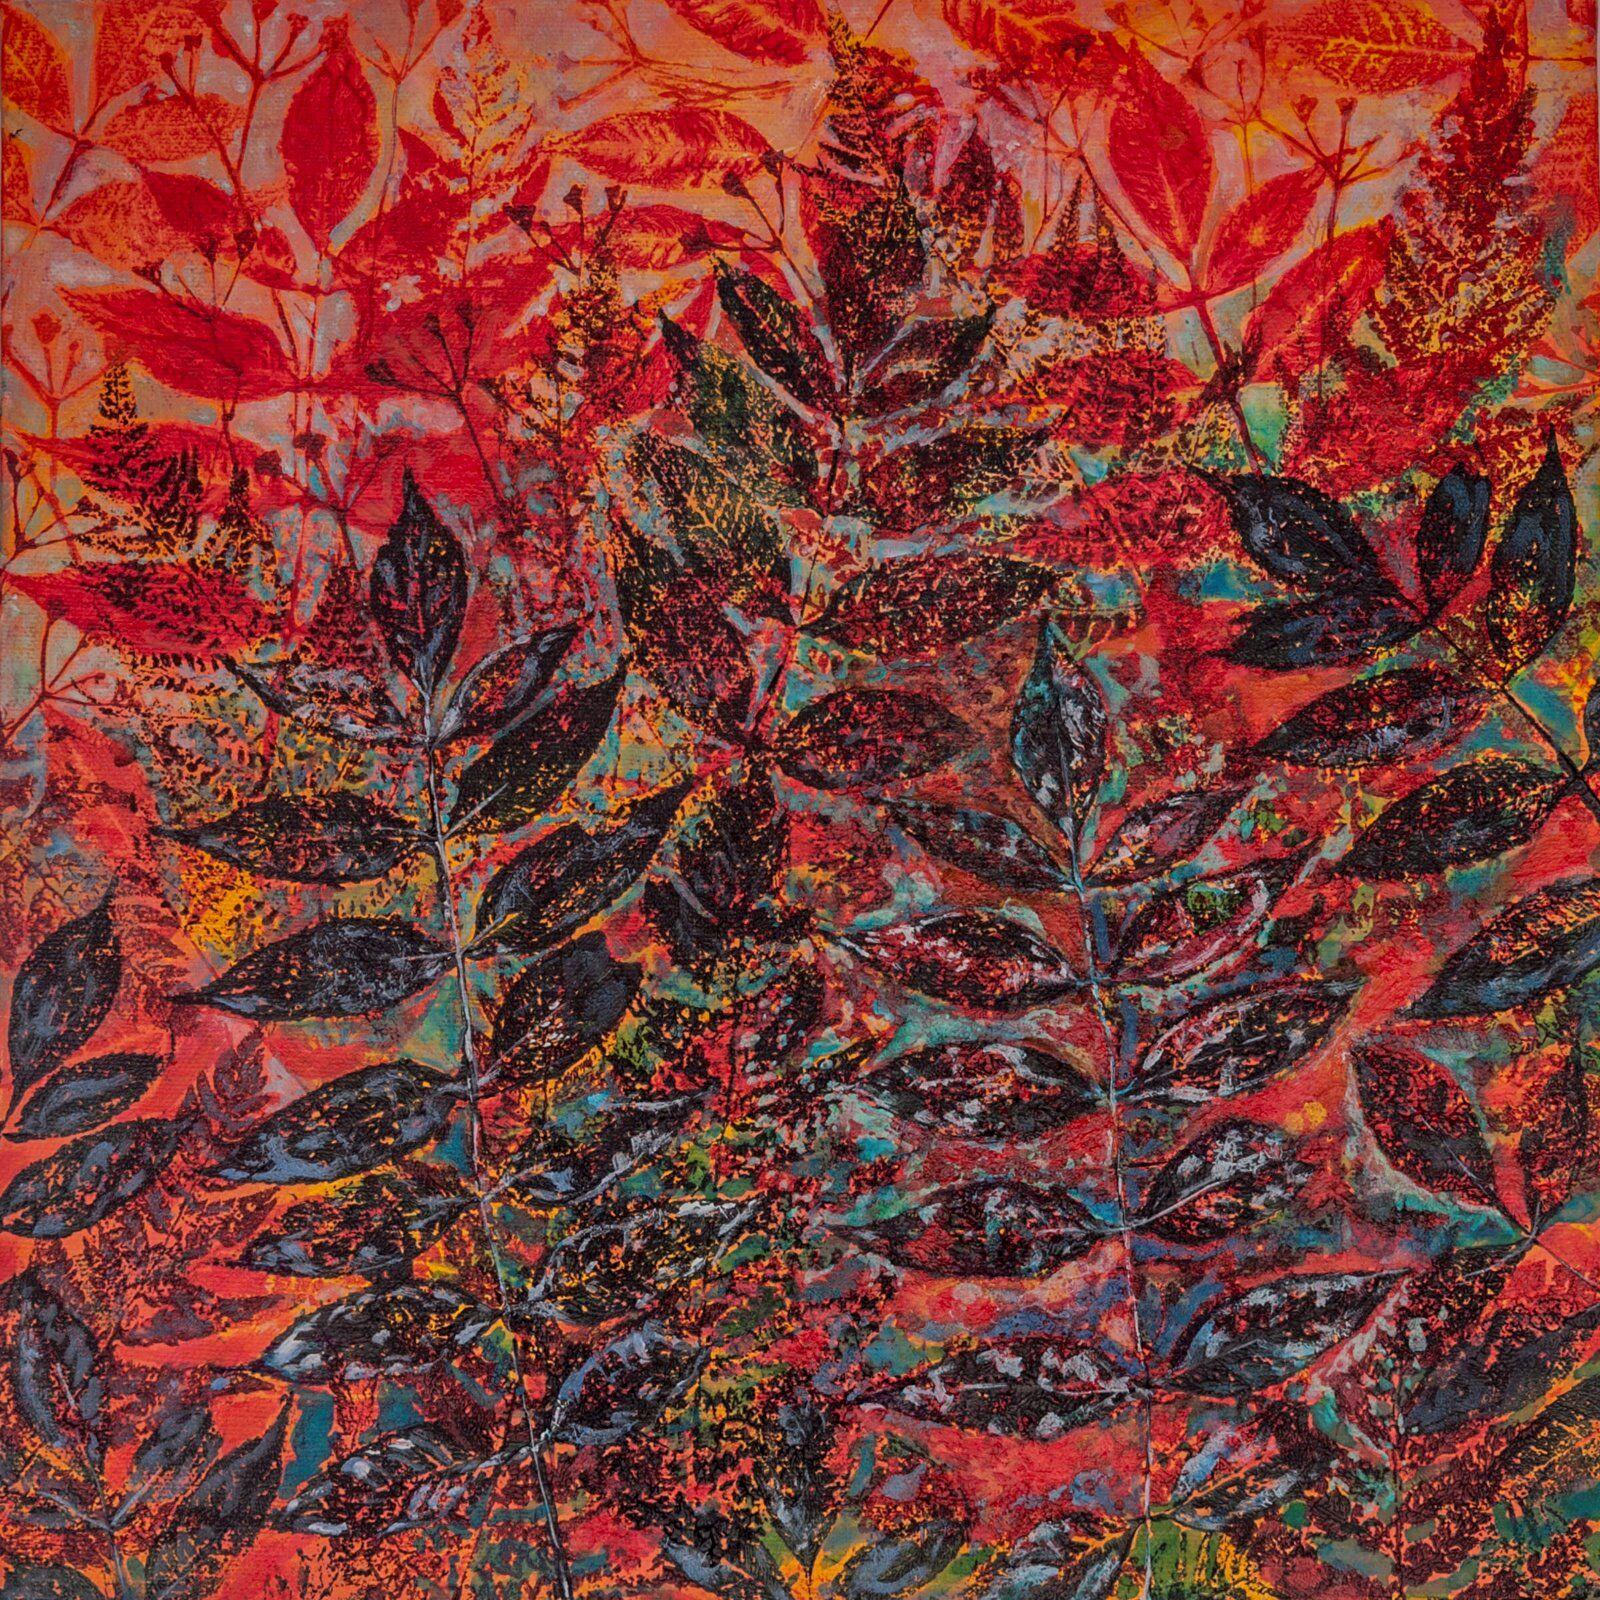 Red Elder and Ferns Giclee